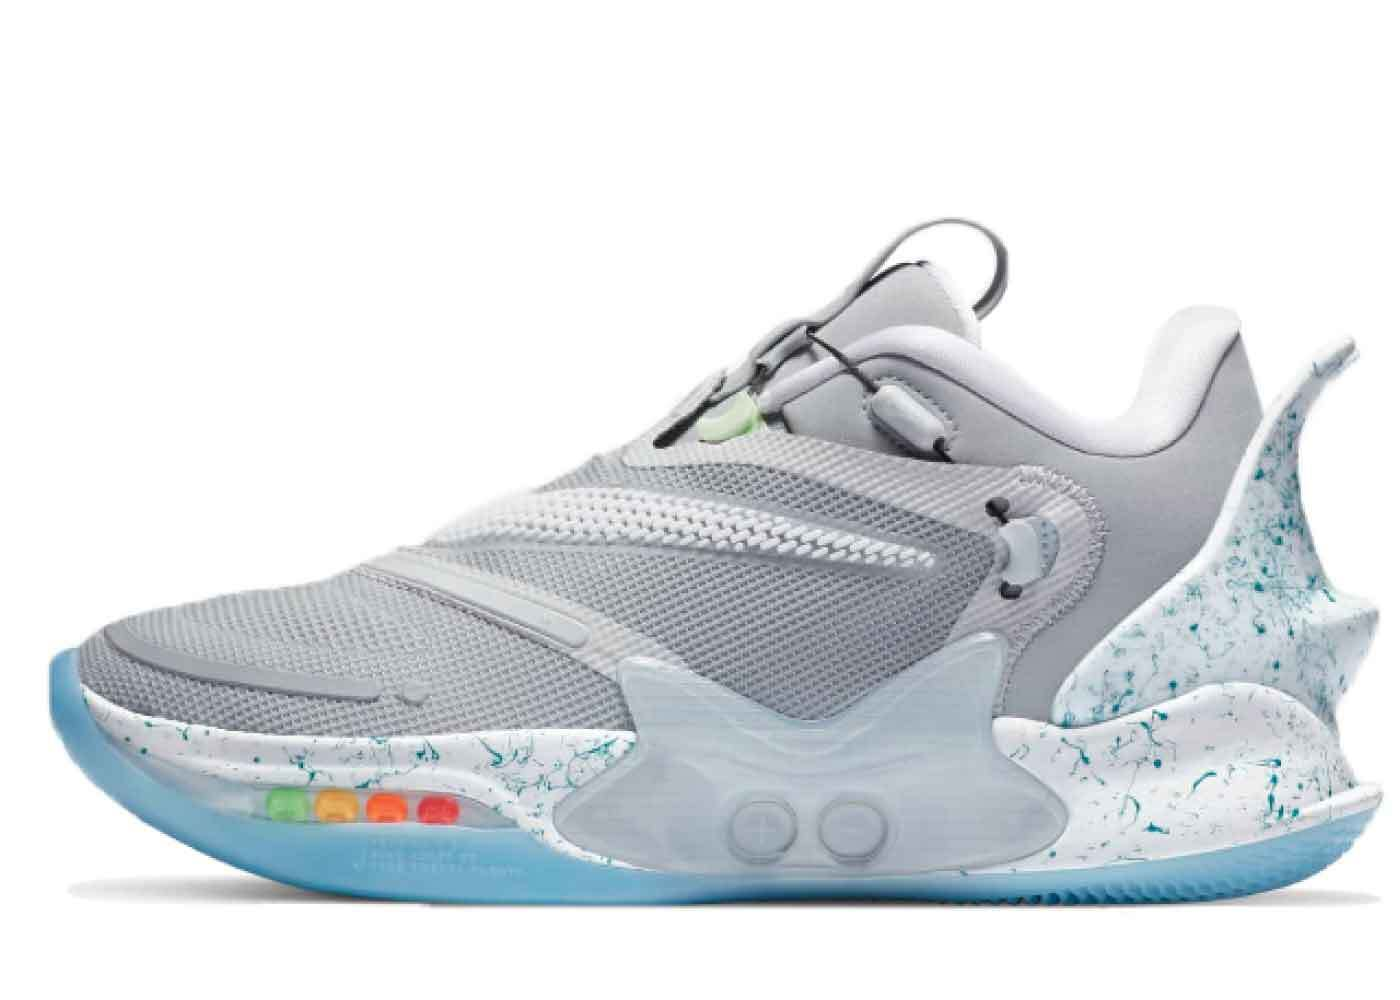 Nike Adapt BB 2.0 Magの写真